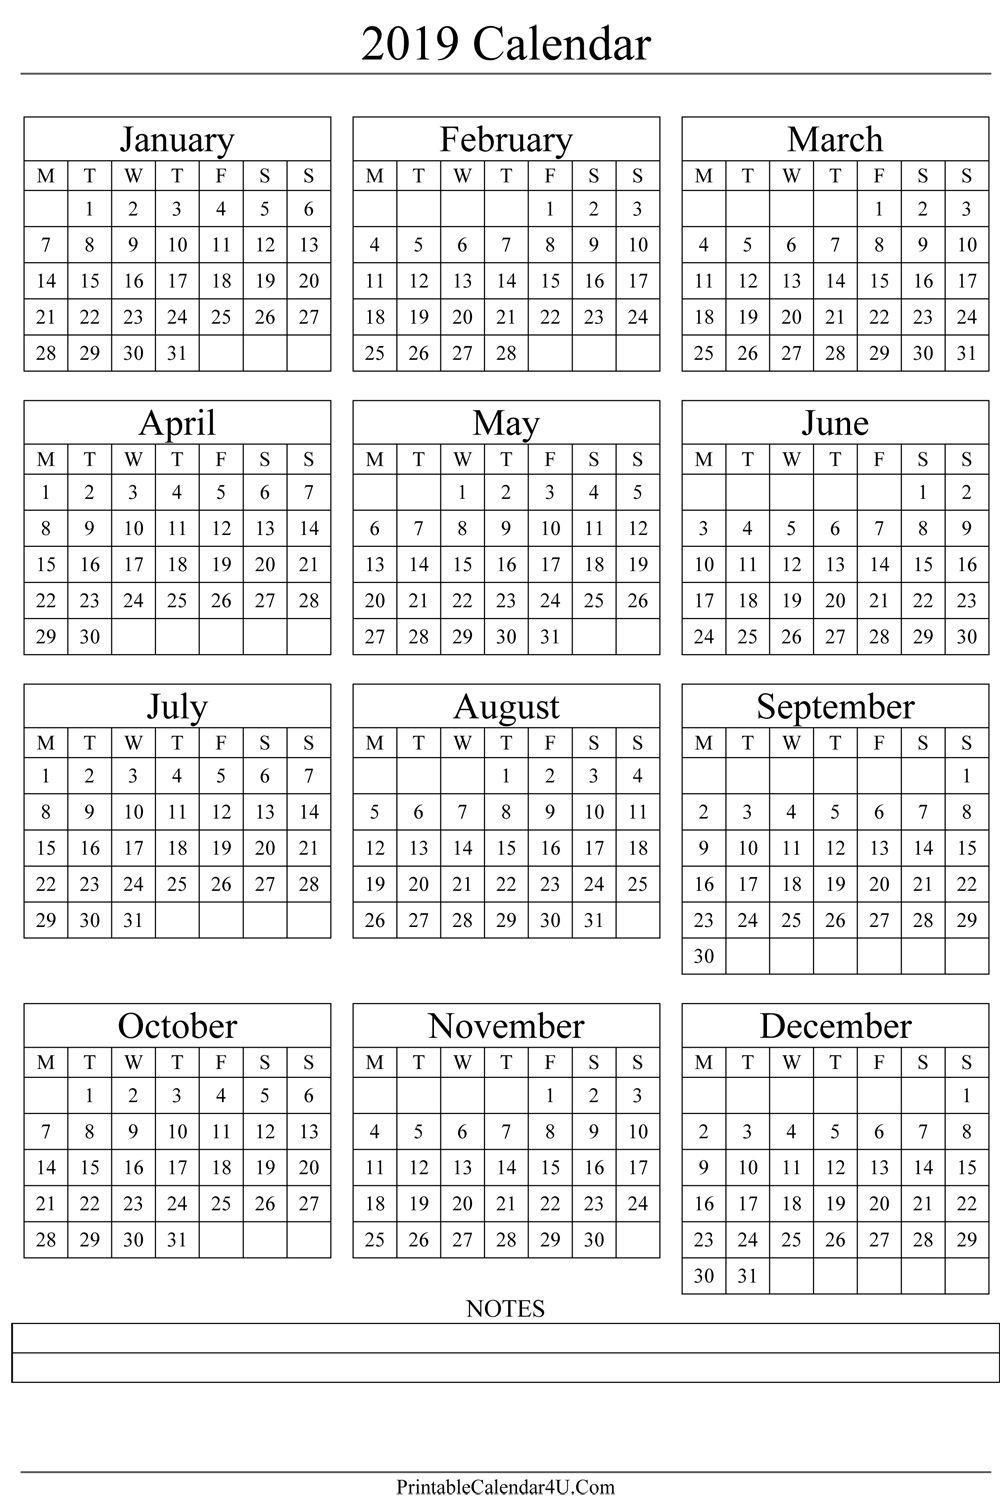 2019 Calendar Printable Yearly